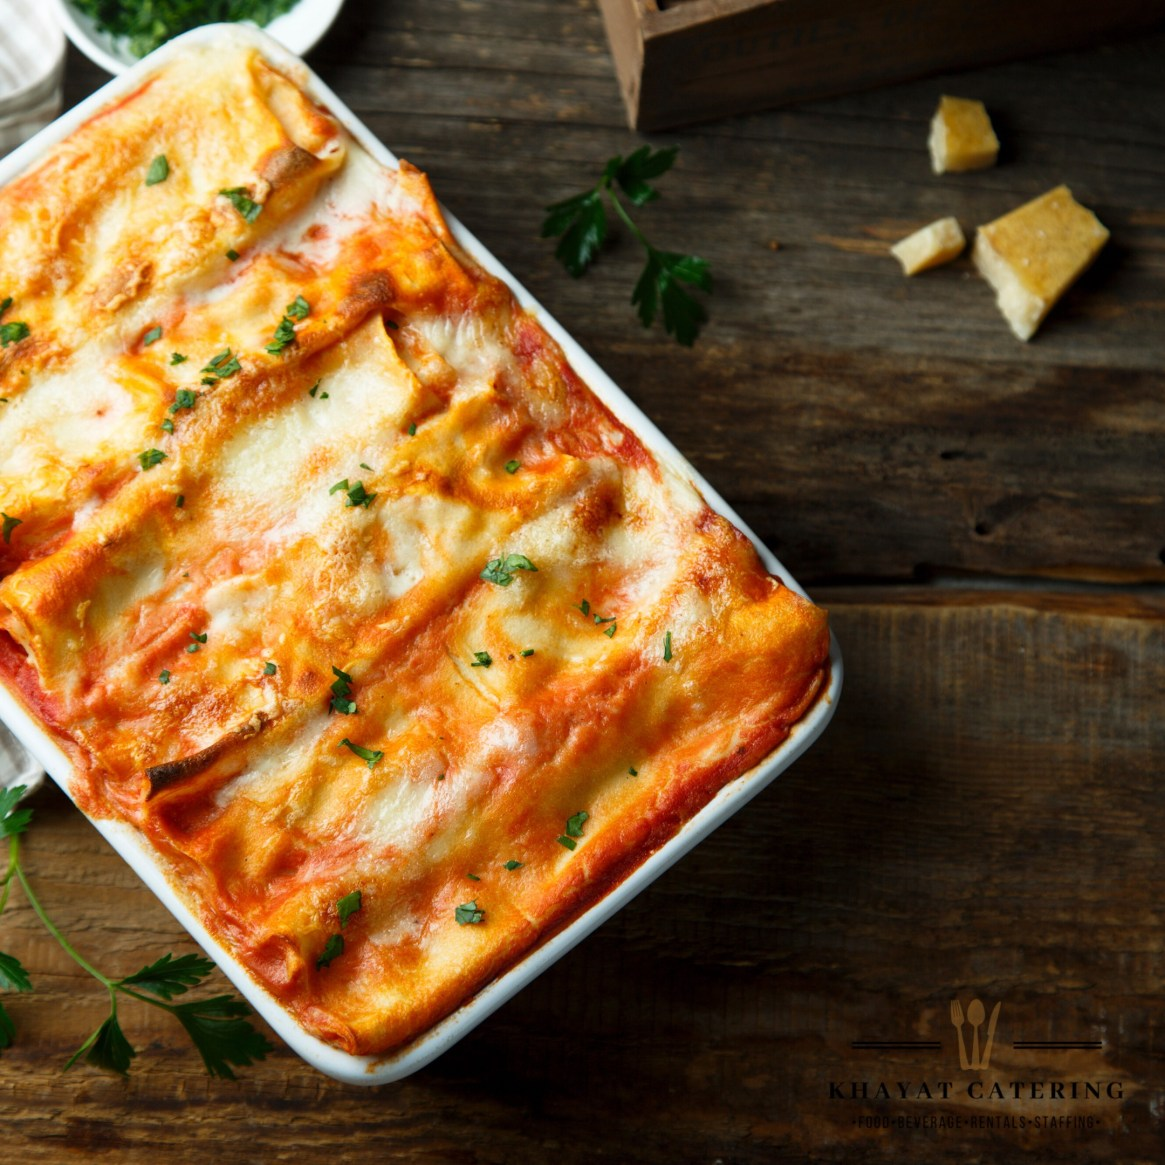 Khayat Catering lasagna